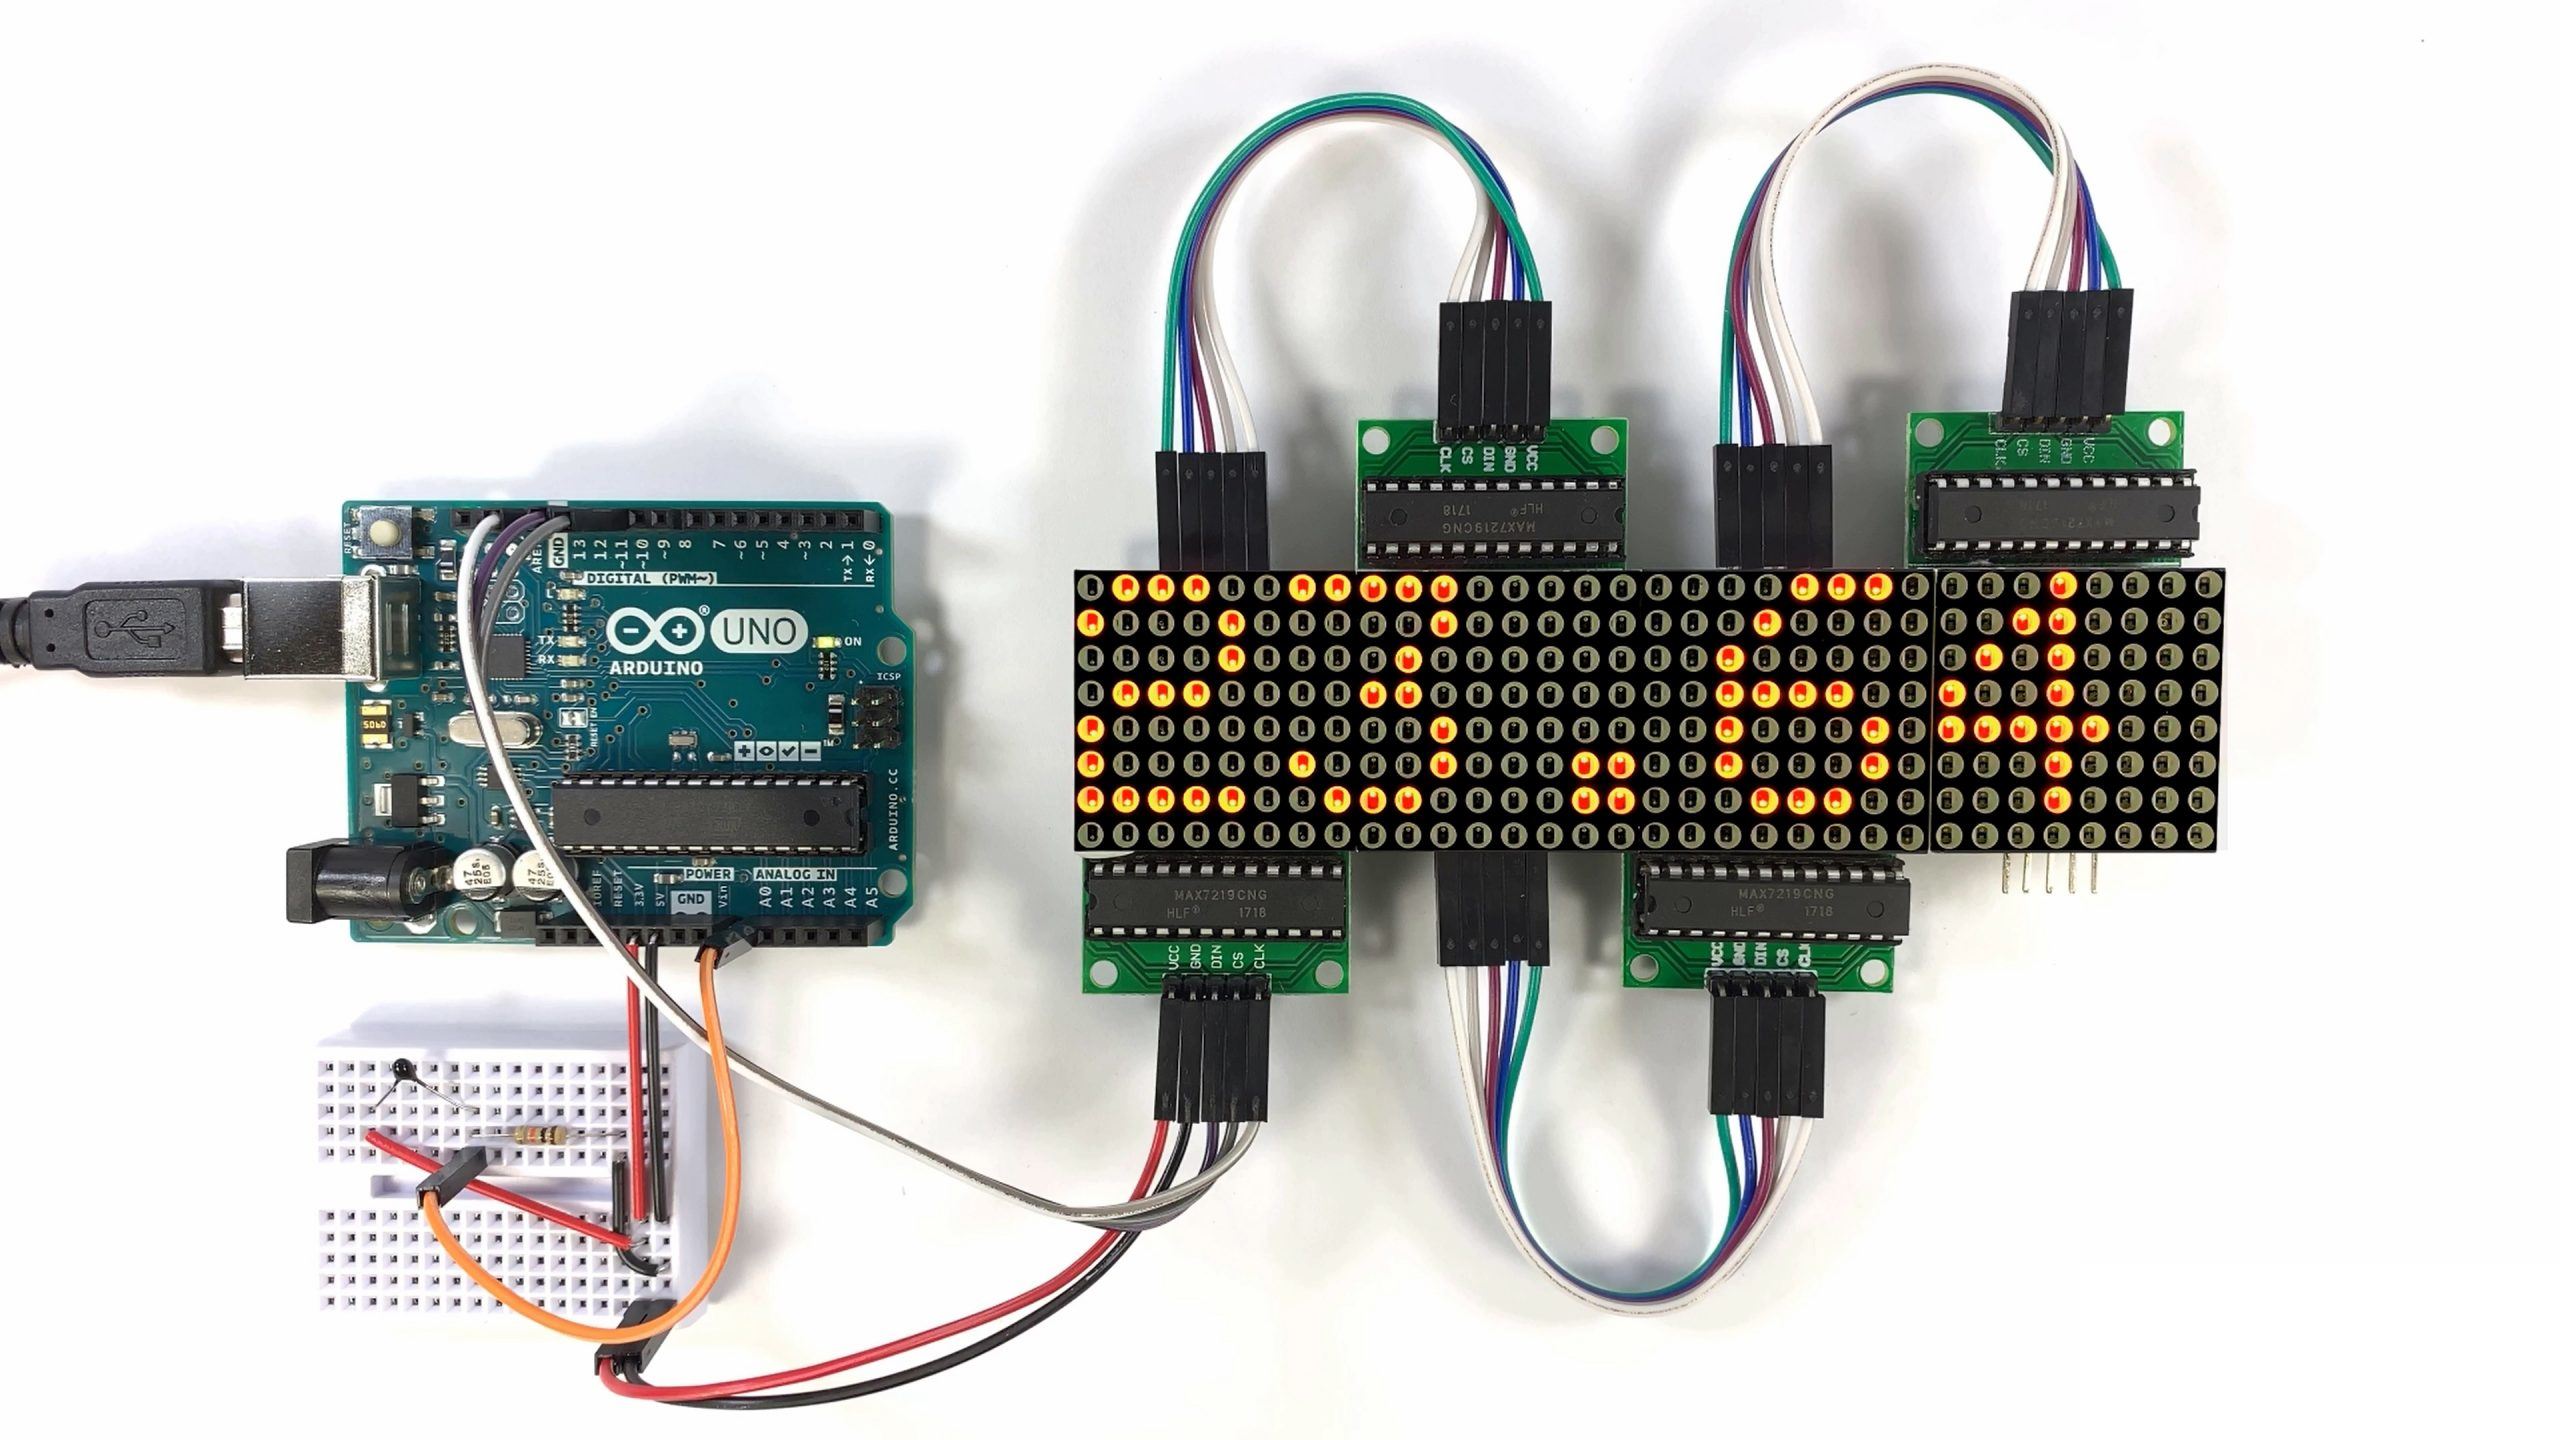 How to Setup an LED Matrix on the Arduino